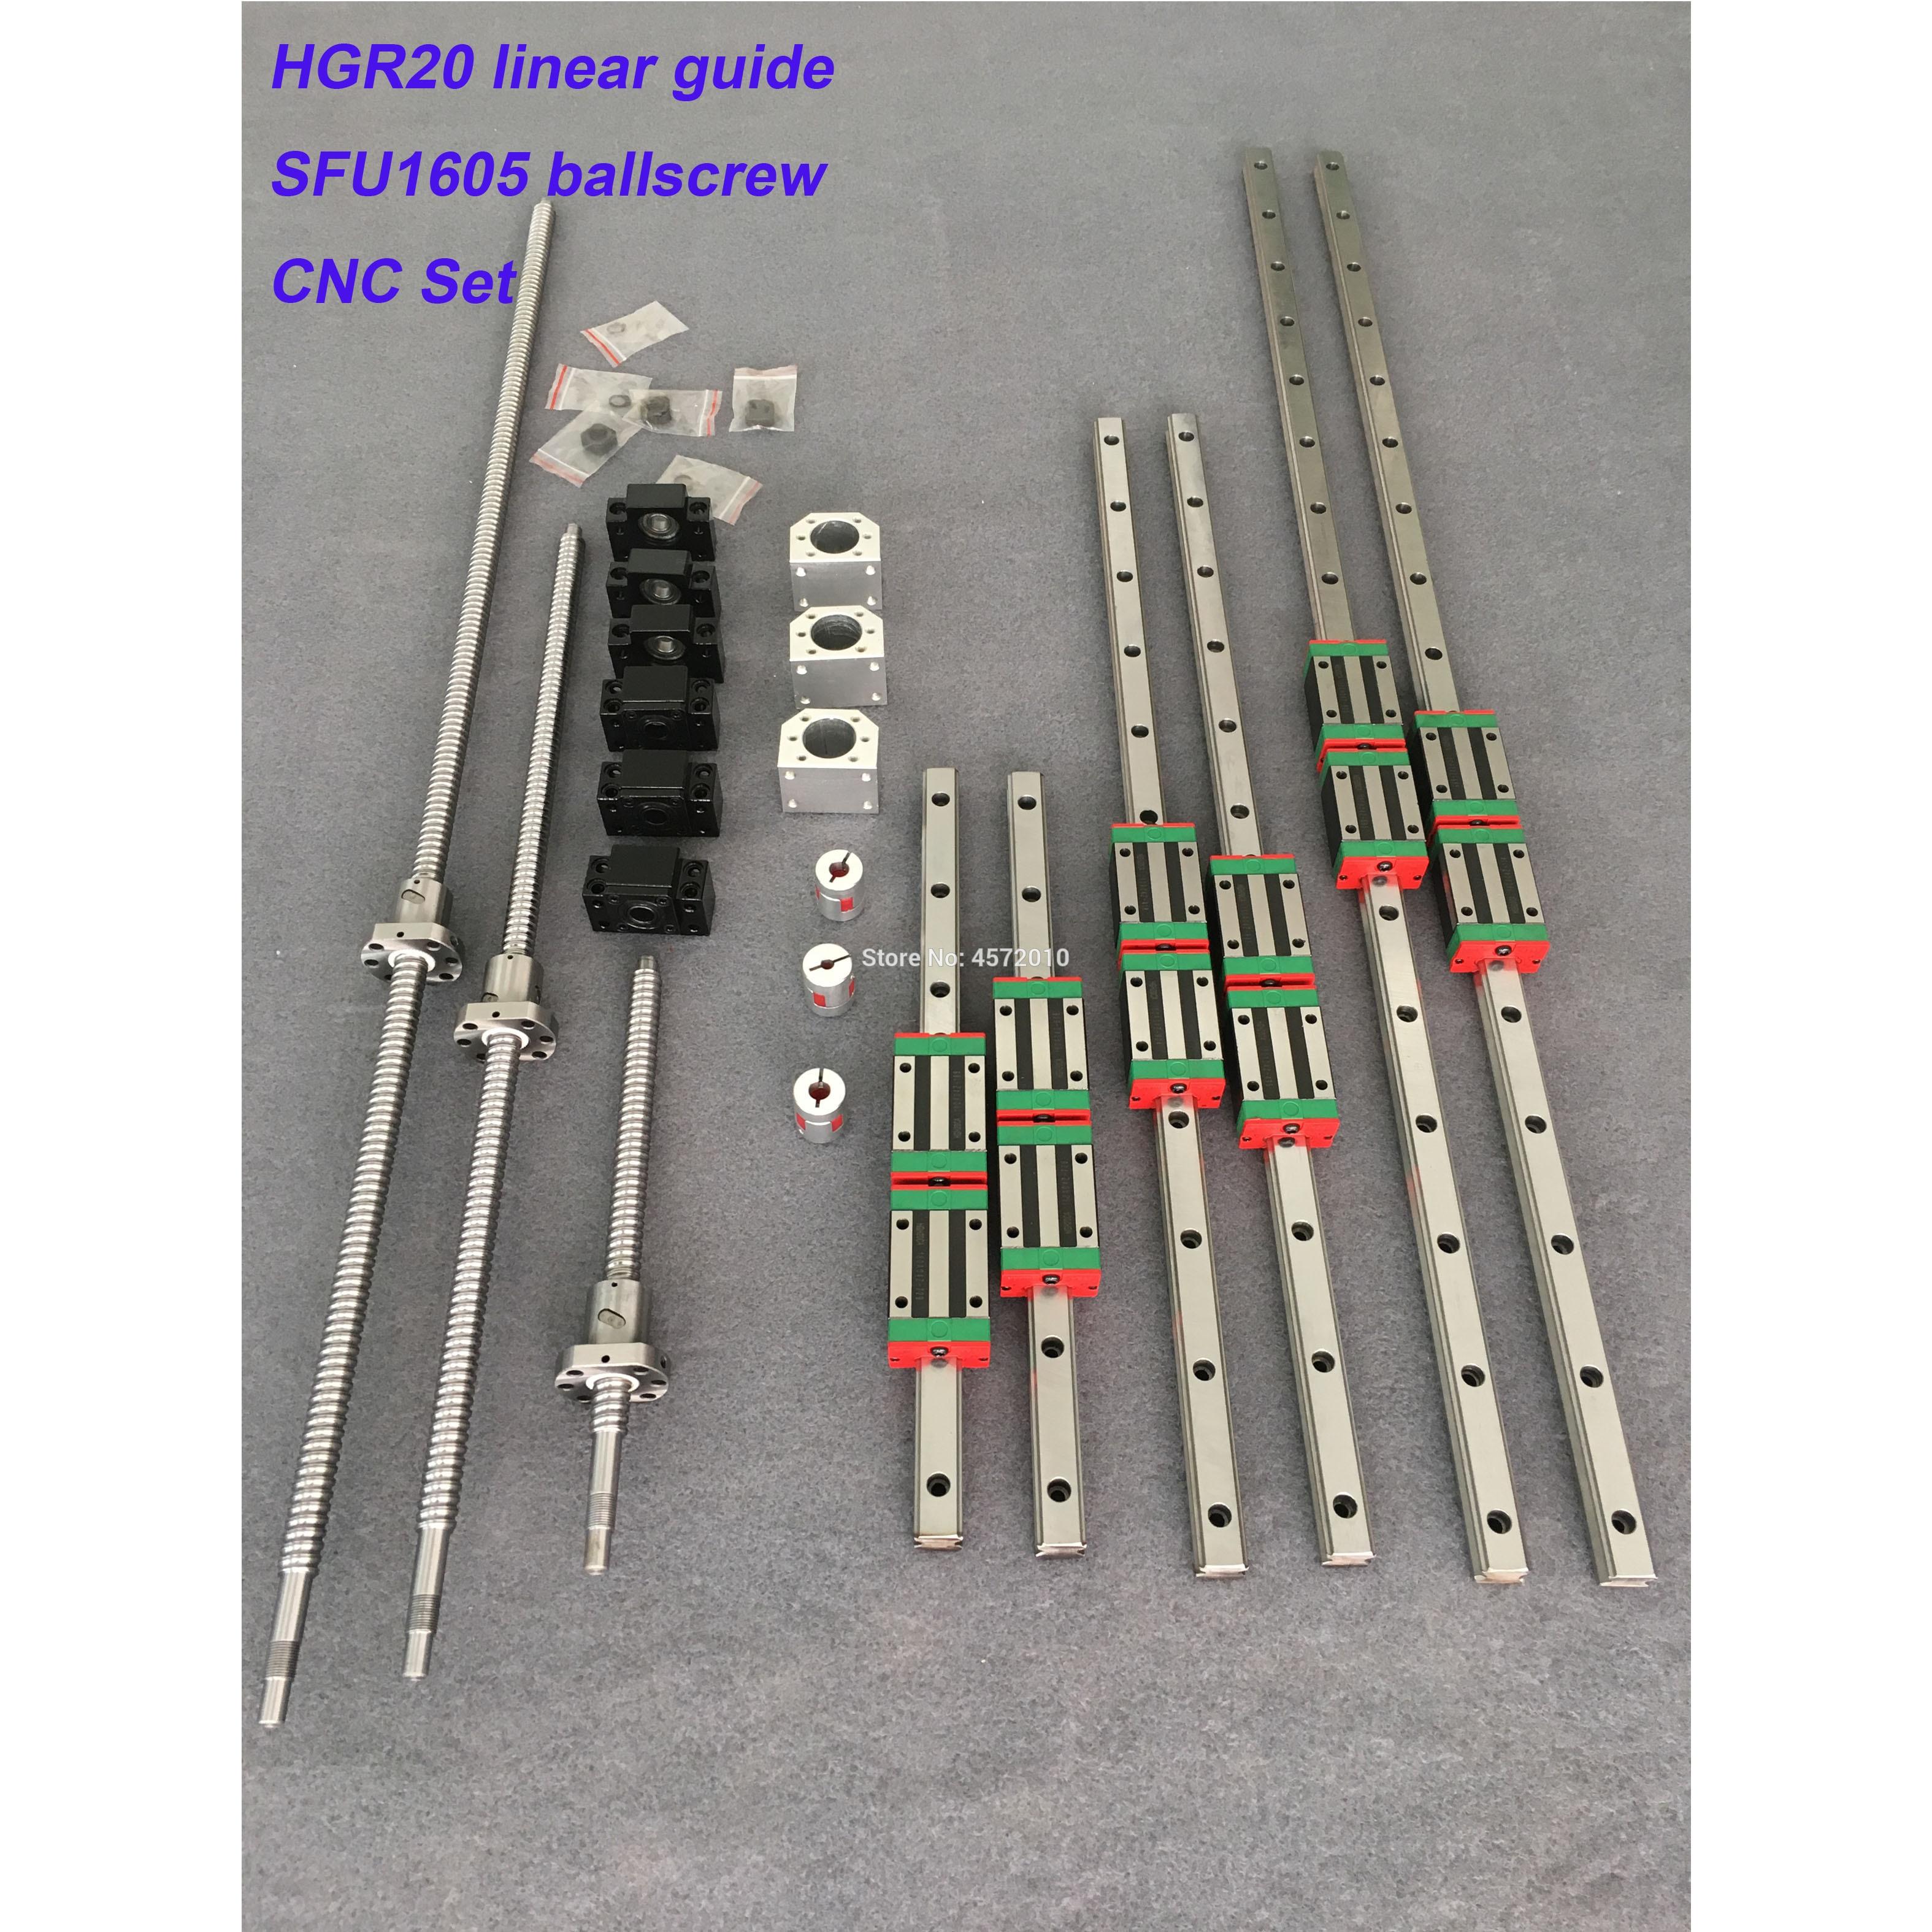 UE RU 6pcs Piazza guida Lineare set HGR20-400/700/1000mm 3pc Vite A Sfere SFU1605-400 /700/1000mm BK/BF Accoppiamento CNC parti